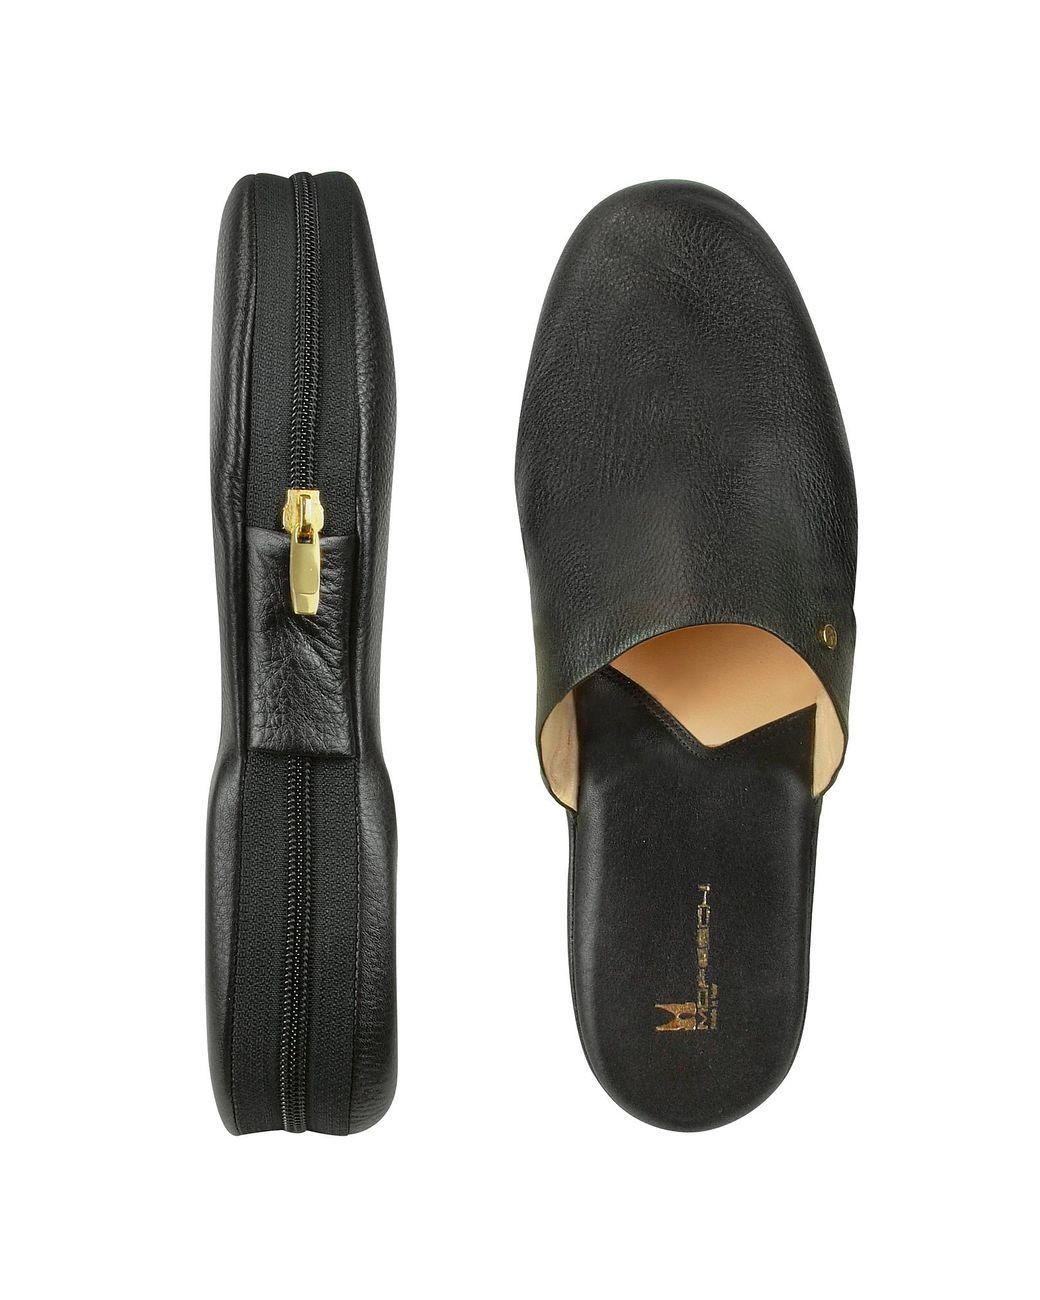 8b358c5904d Men s Amerigo - Black Calf Leather Travel Slippers W case